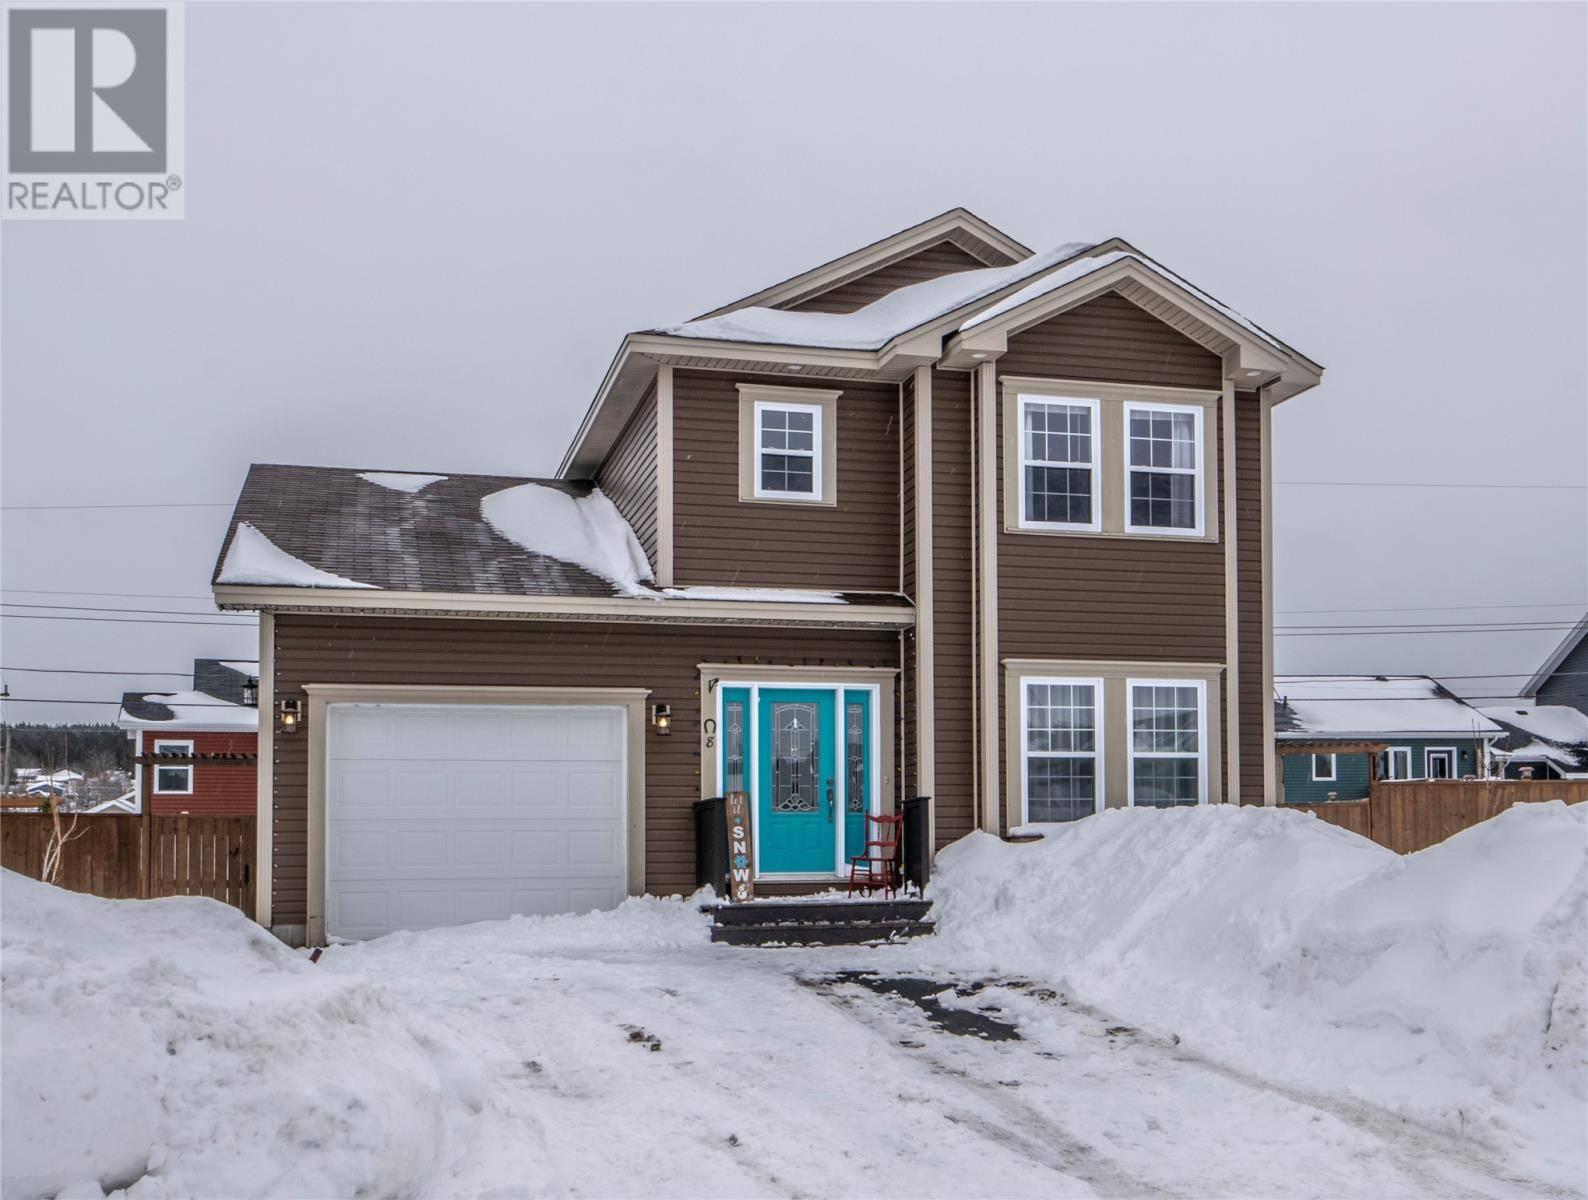 House for sale at 8 Galashiels Pl St. John's Newfoundland - MLS: 1211483